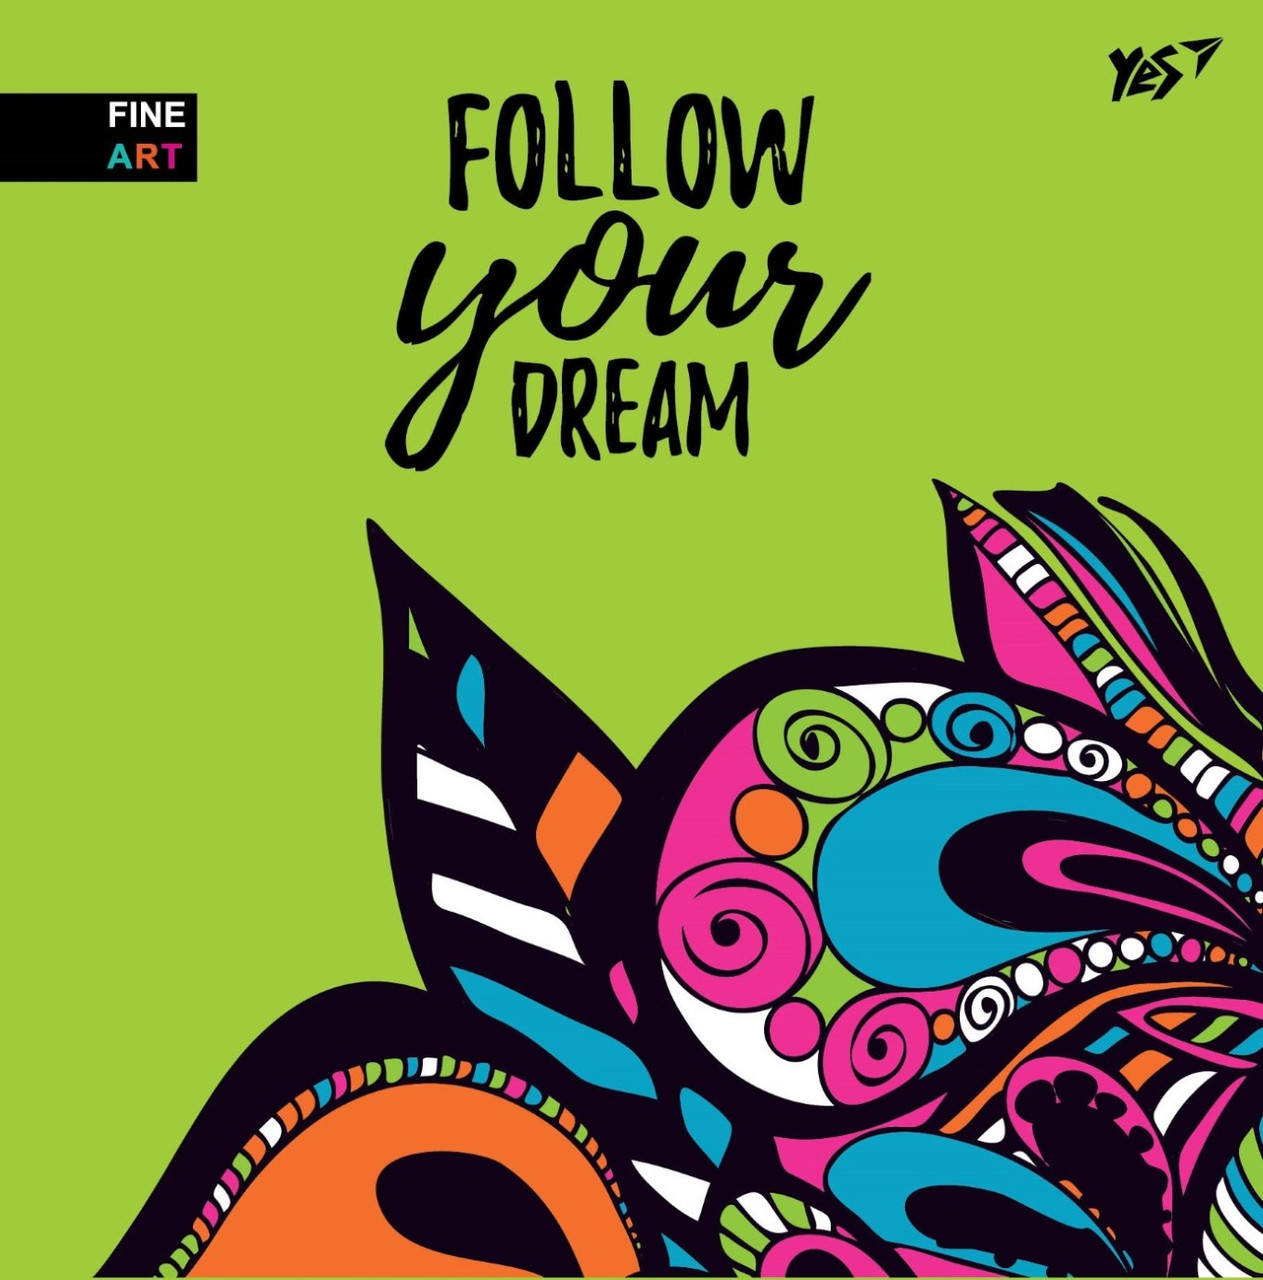 Блокнот A5+ 64арк. б/лін. Follow your dream інтегр. обкл. №151527/Yes/(3)